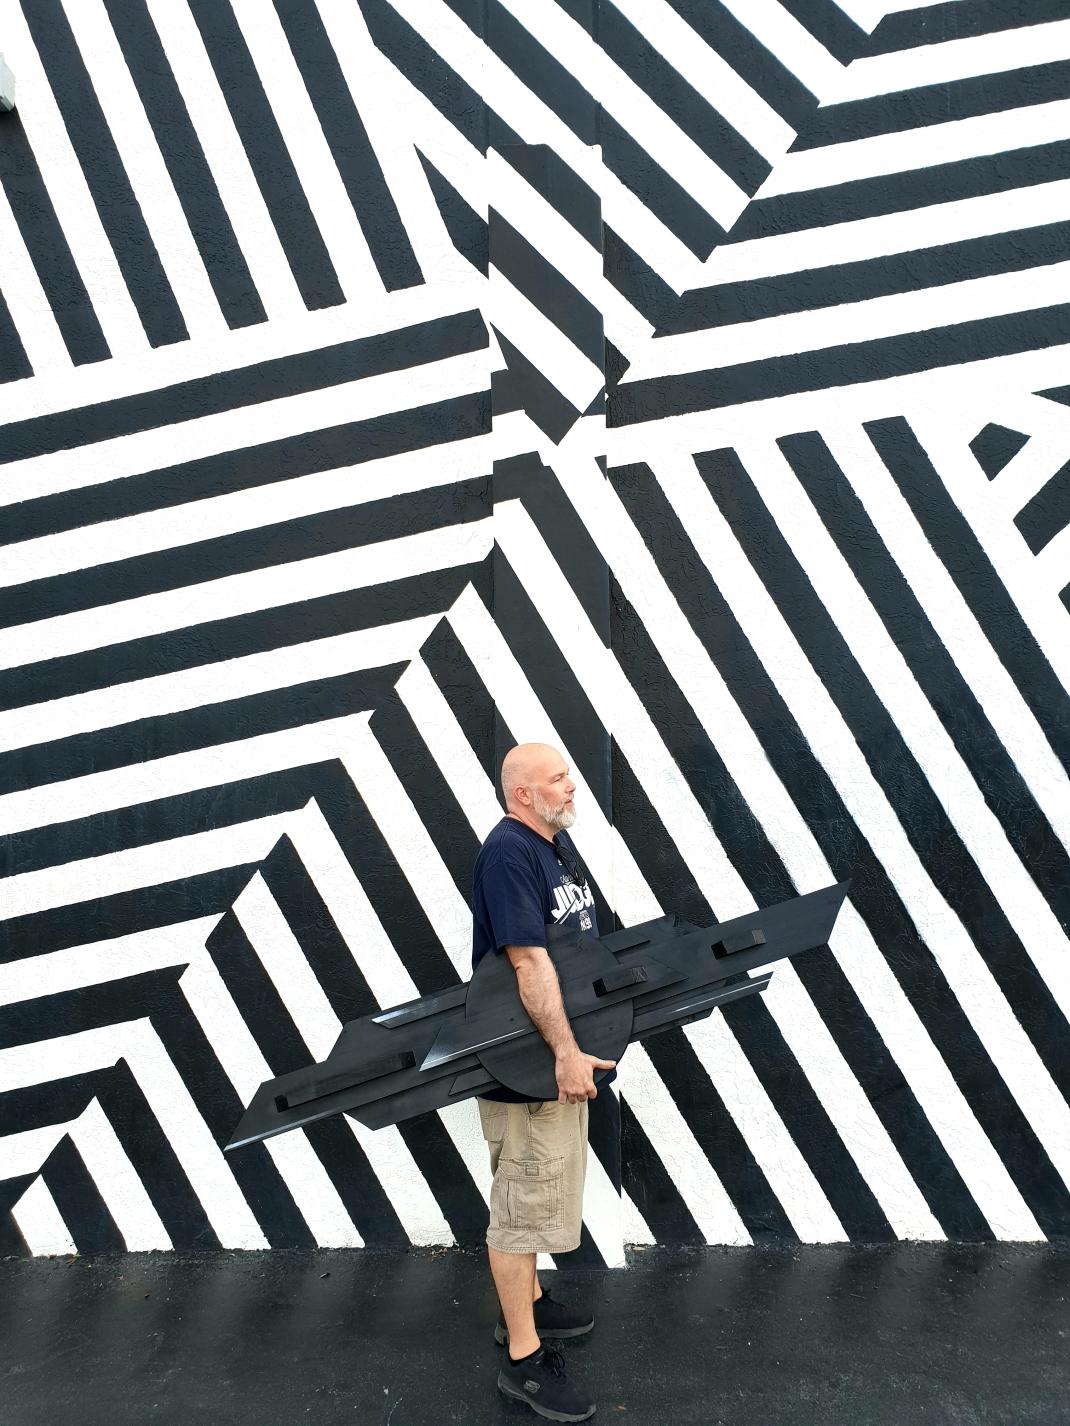 Magaldi Live painting Miami 2018 (2)